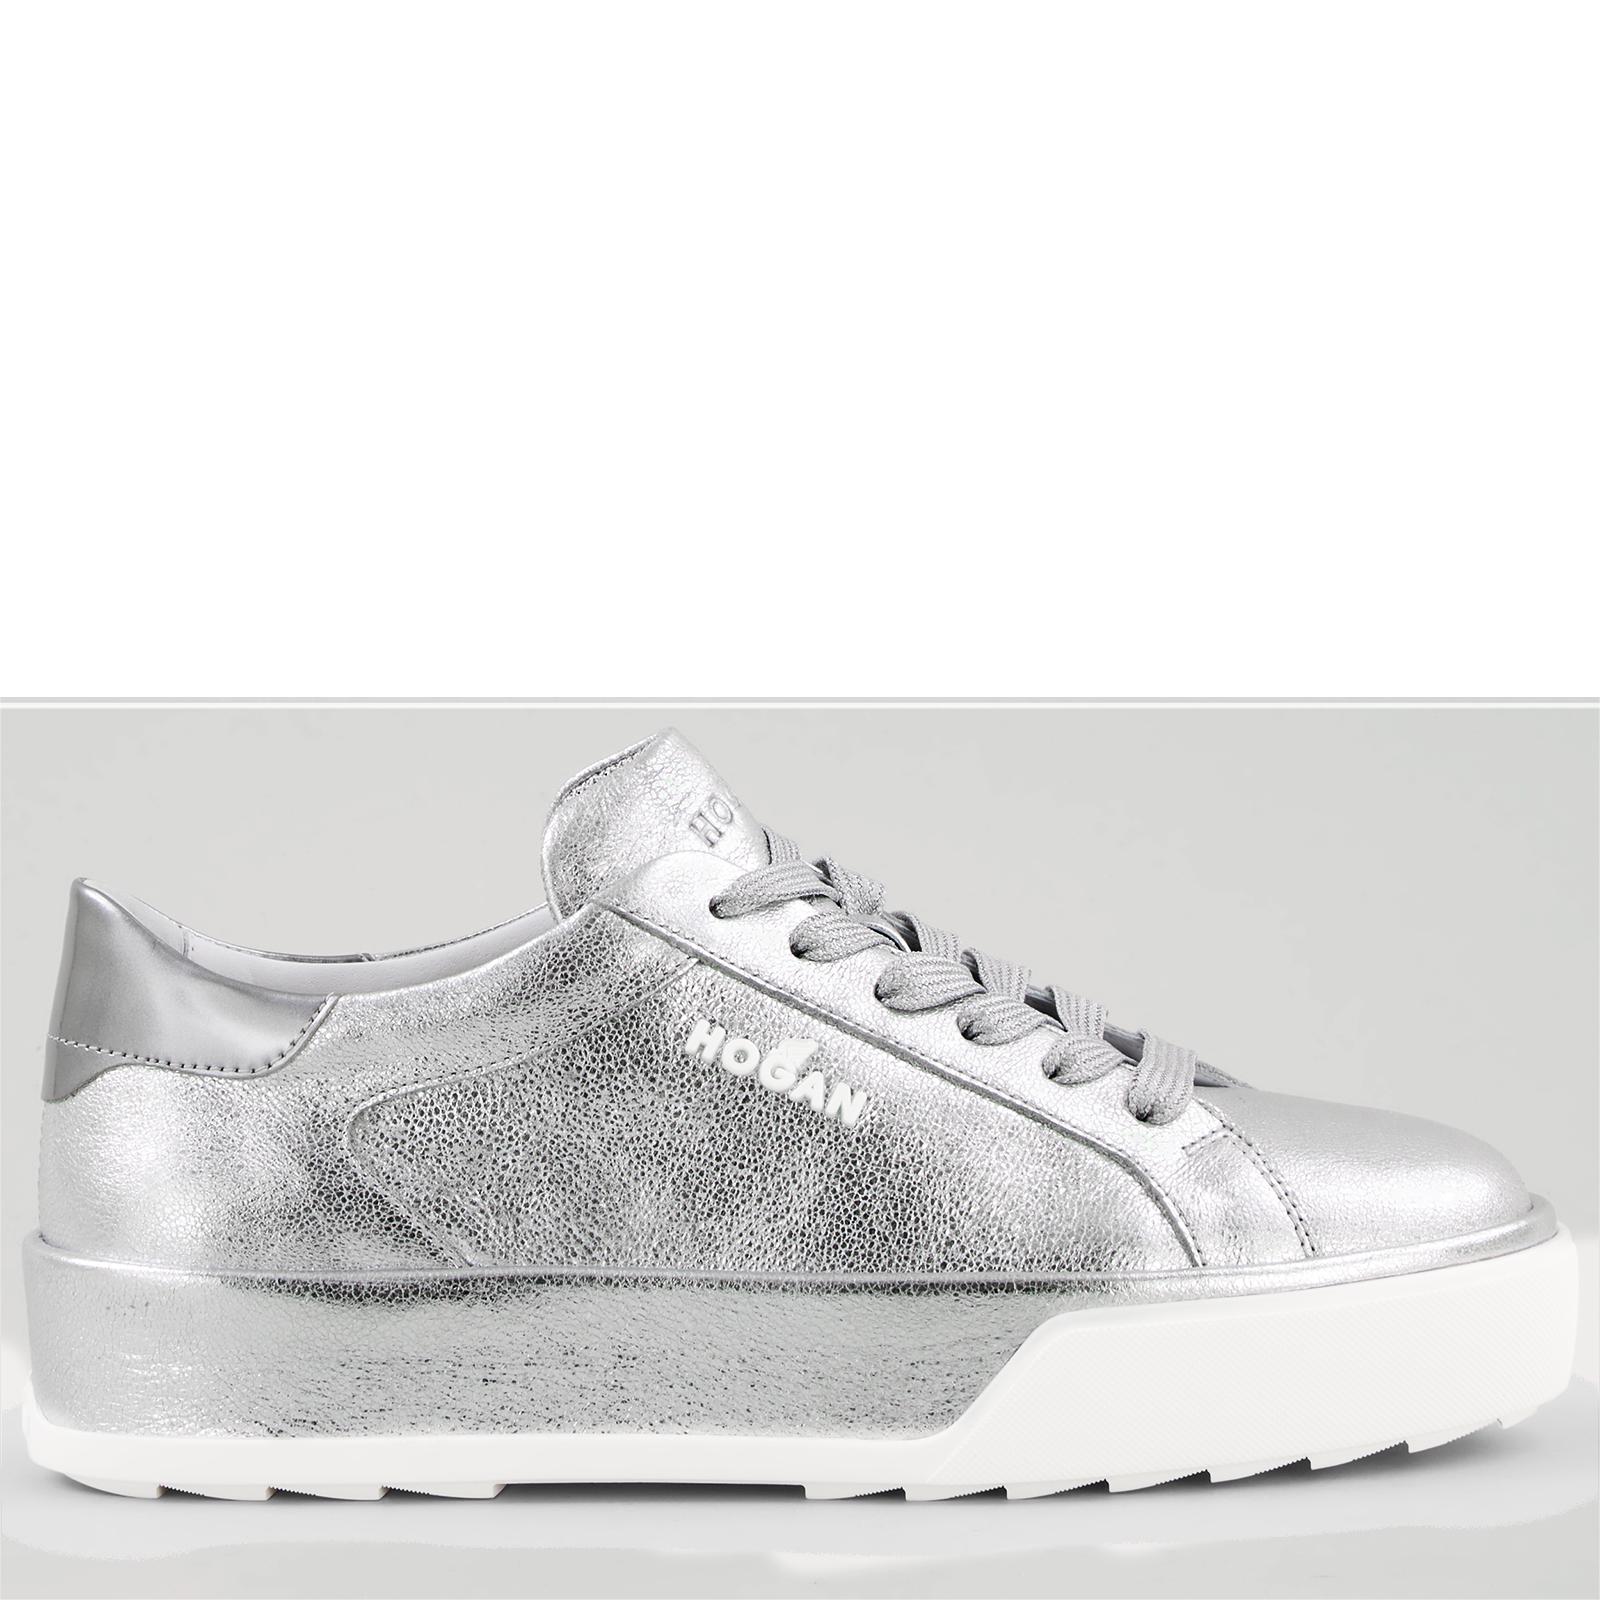 Hogan - Sneakers - H320 In Silber | ModeSens